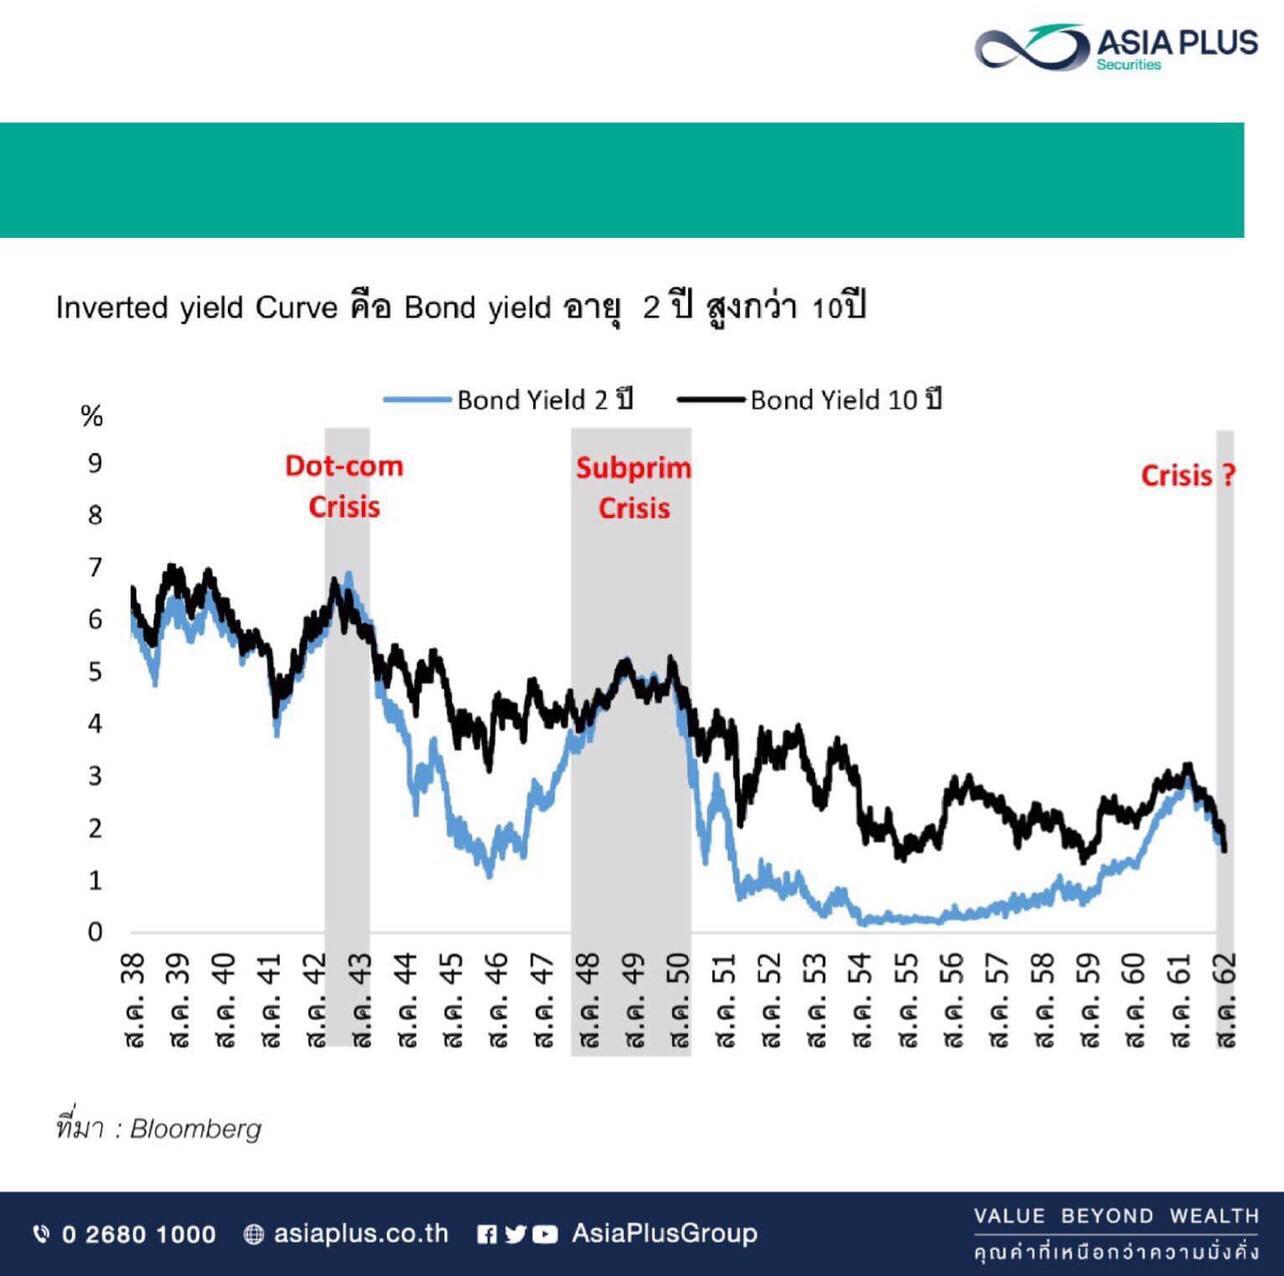 """Inverted Yield curve สหรัฐฯ ครั้งนี้ สะท้อนเศรษฐกิจถดถอยหรือไม่?"